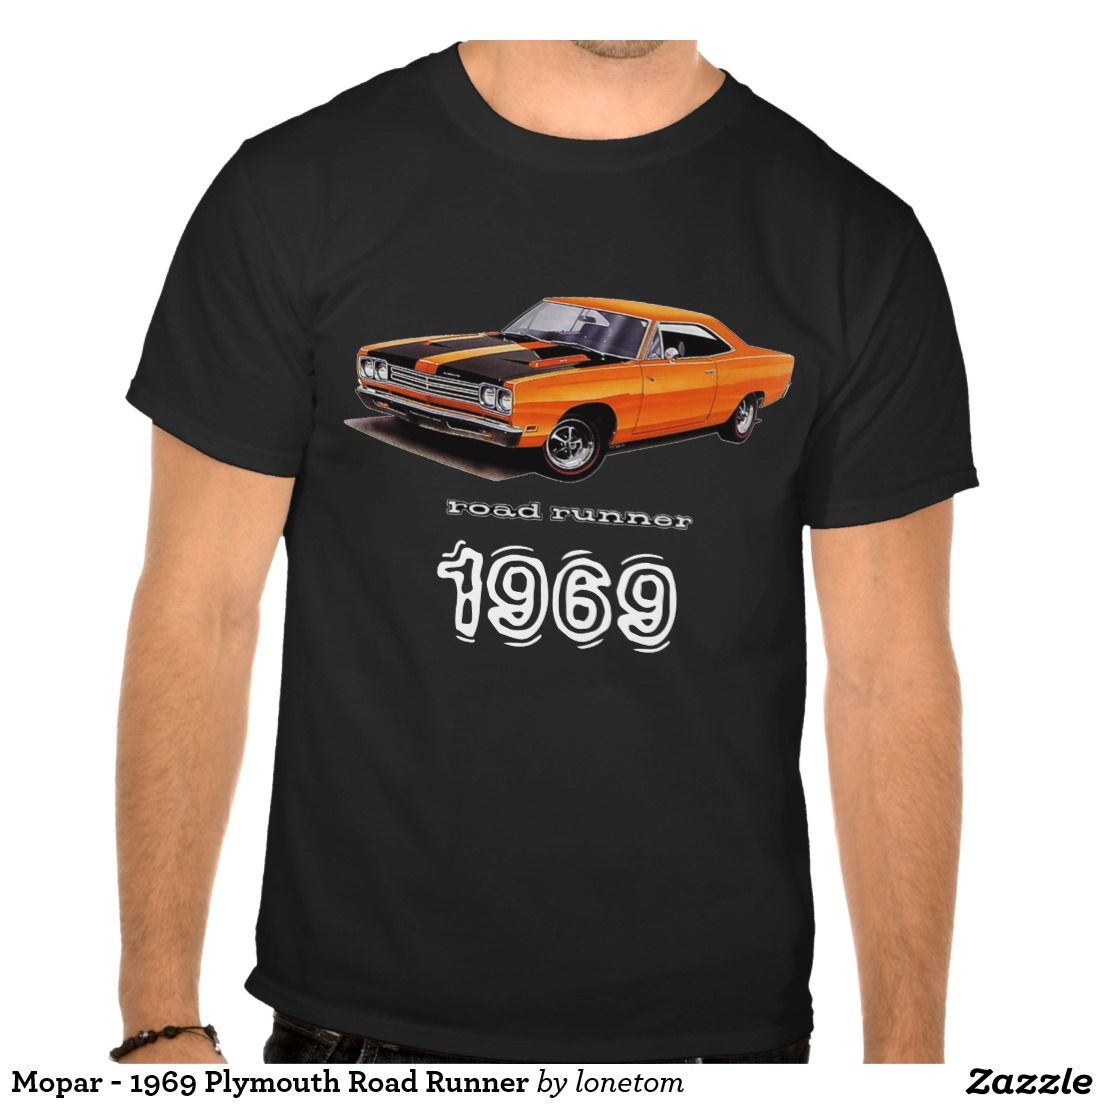 fbb552a8 Mopar - 1969 Plymouth Road Runner T-Shirt | Zazzle.com | 69 ...